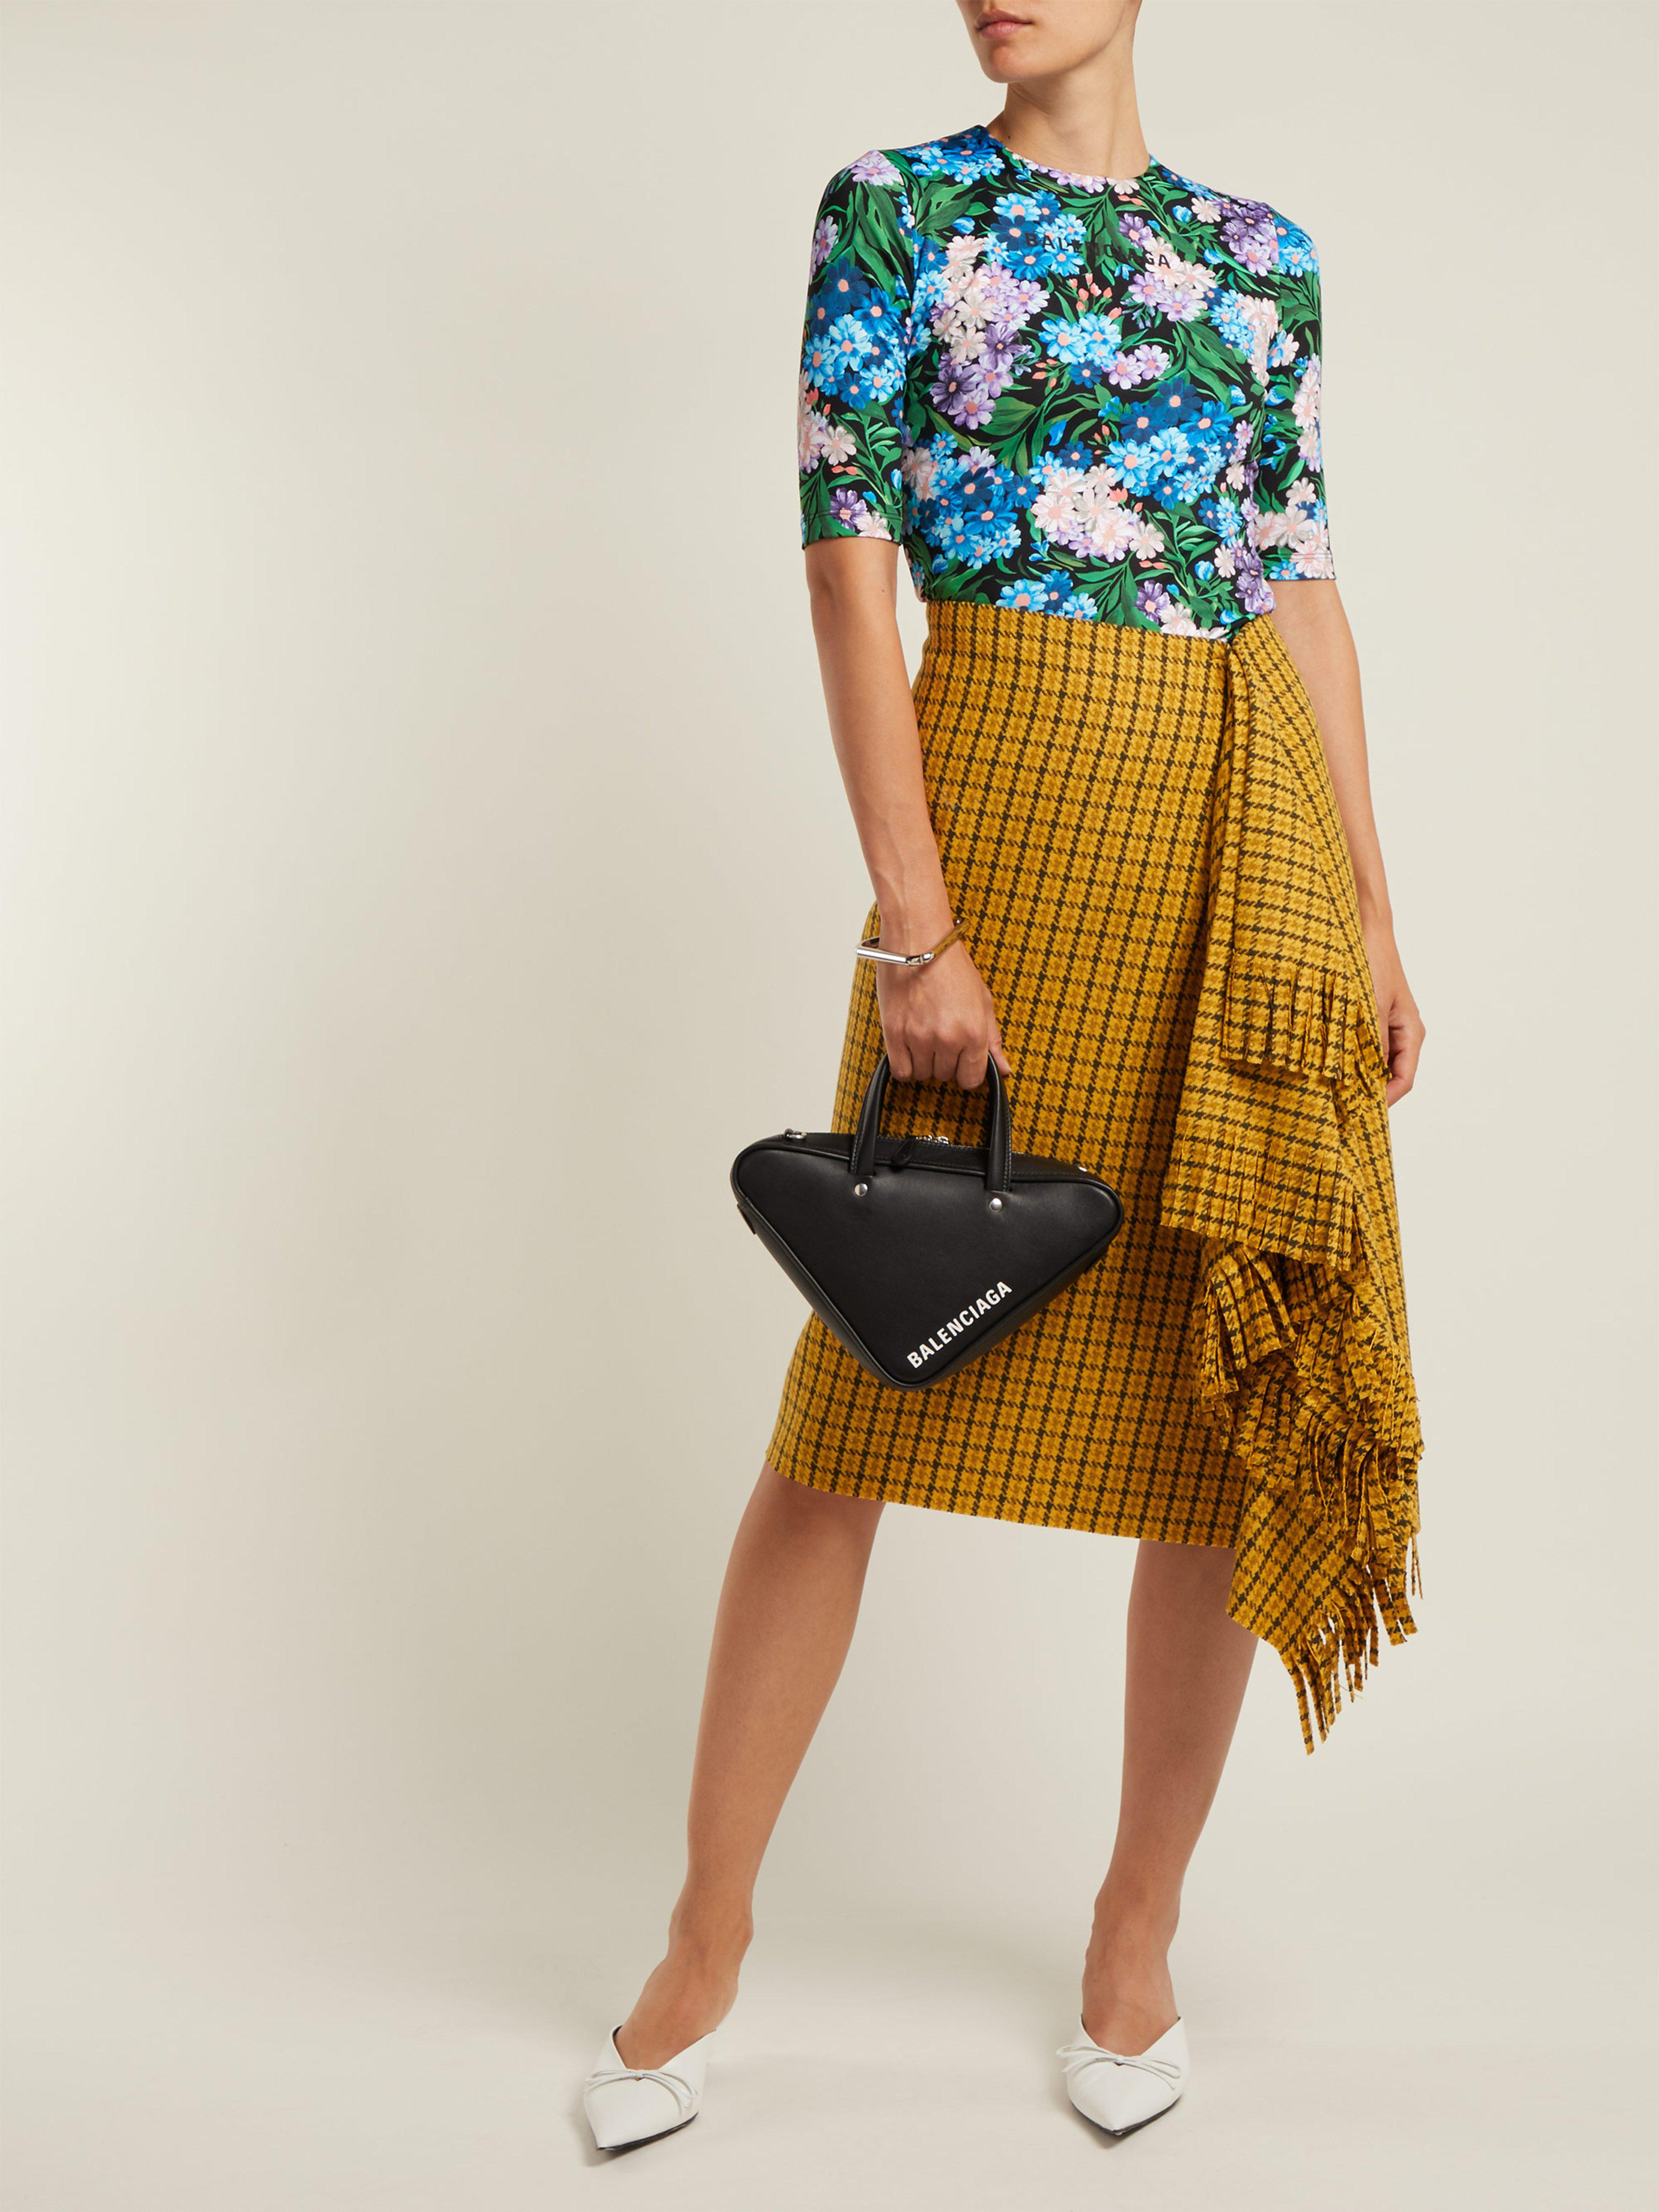 77941852a30a Balenciaga - Multicolor Logo And Floral Print Stretch Jersey Top - Lyst.  View fullscreen